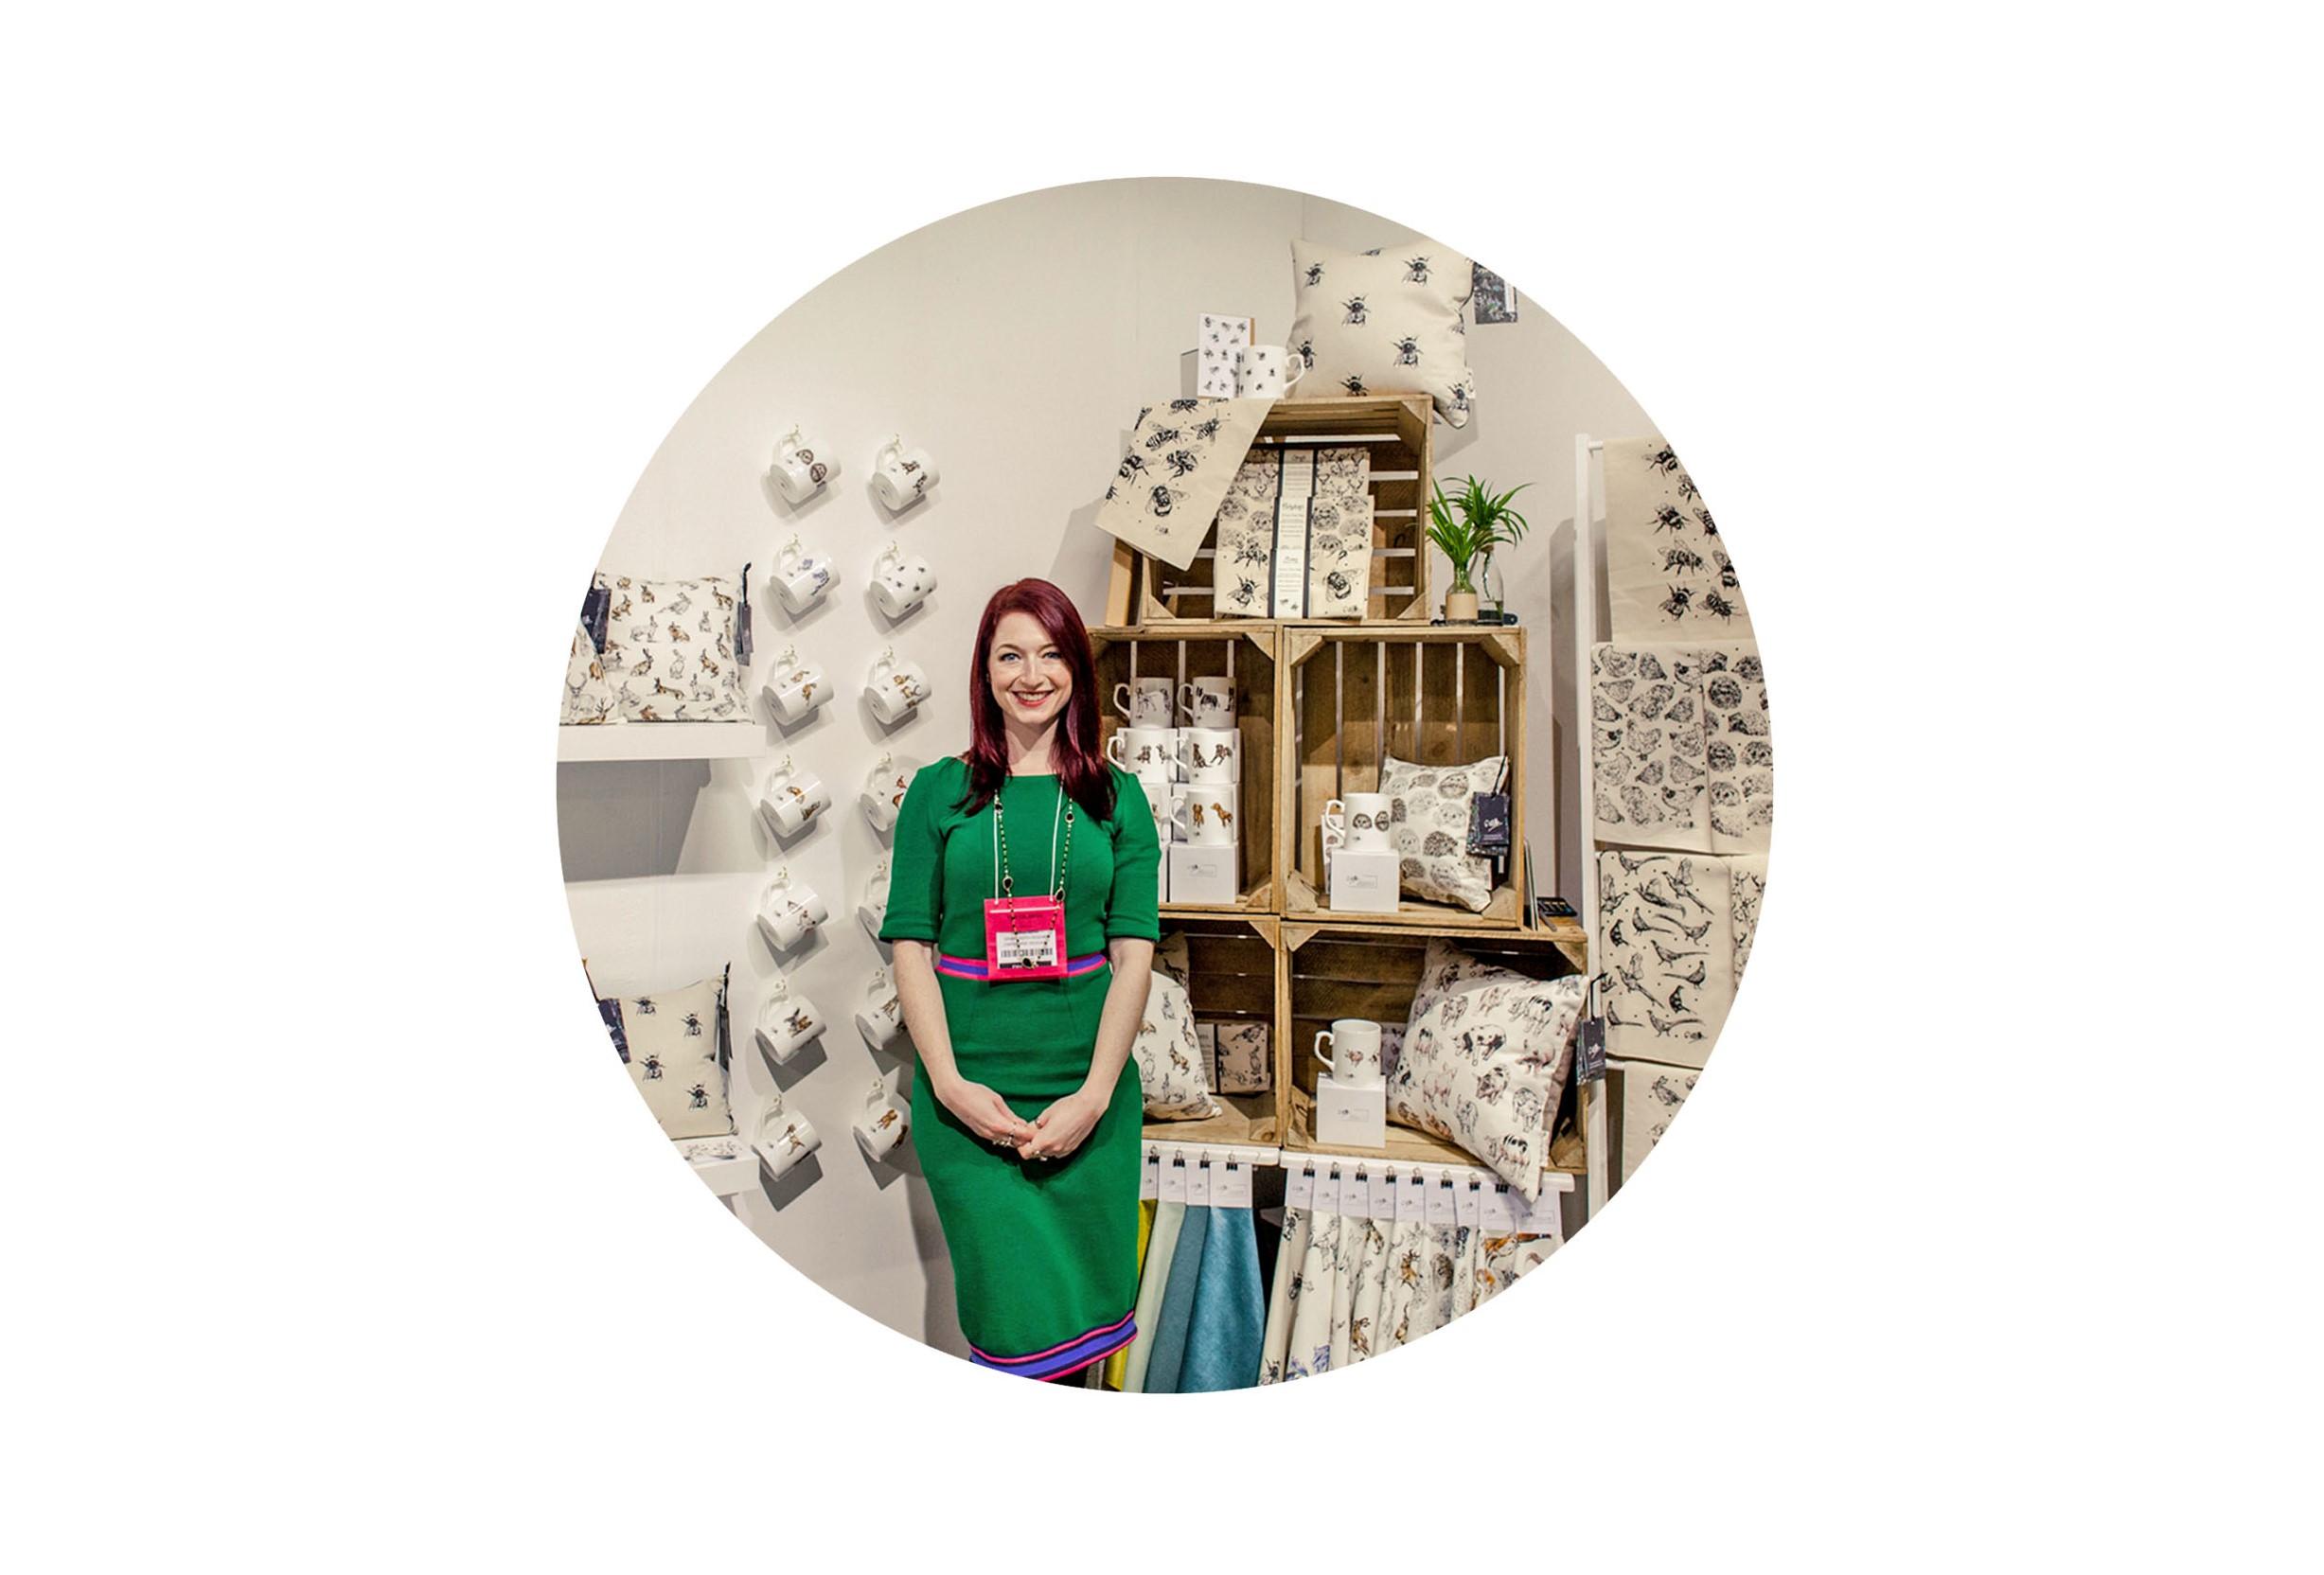 Gemma Keith Designs